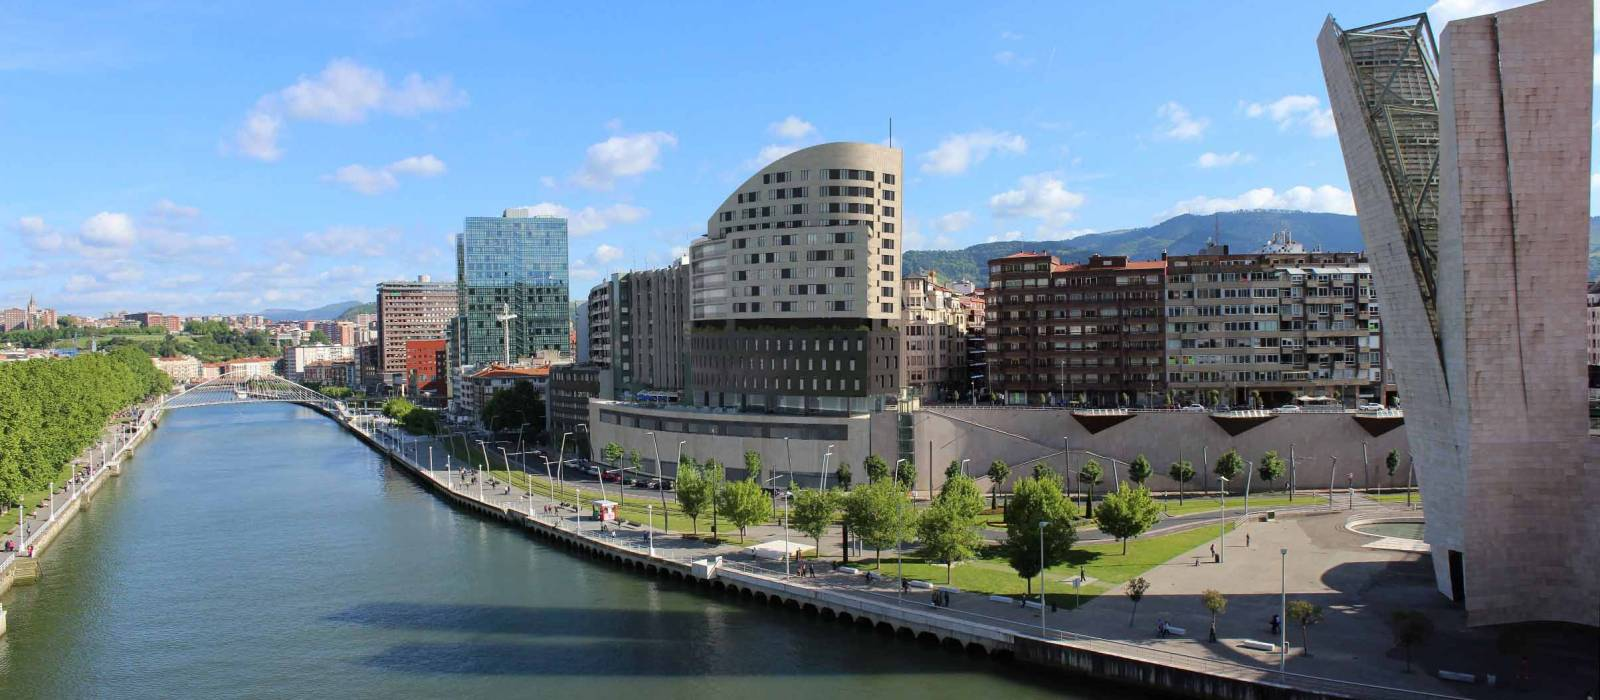 Hotel Vincci Consulado de Bilbao Außenansicht